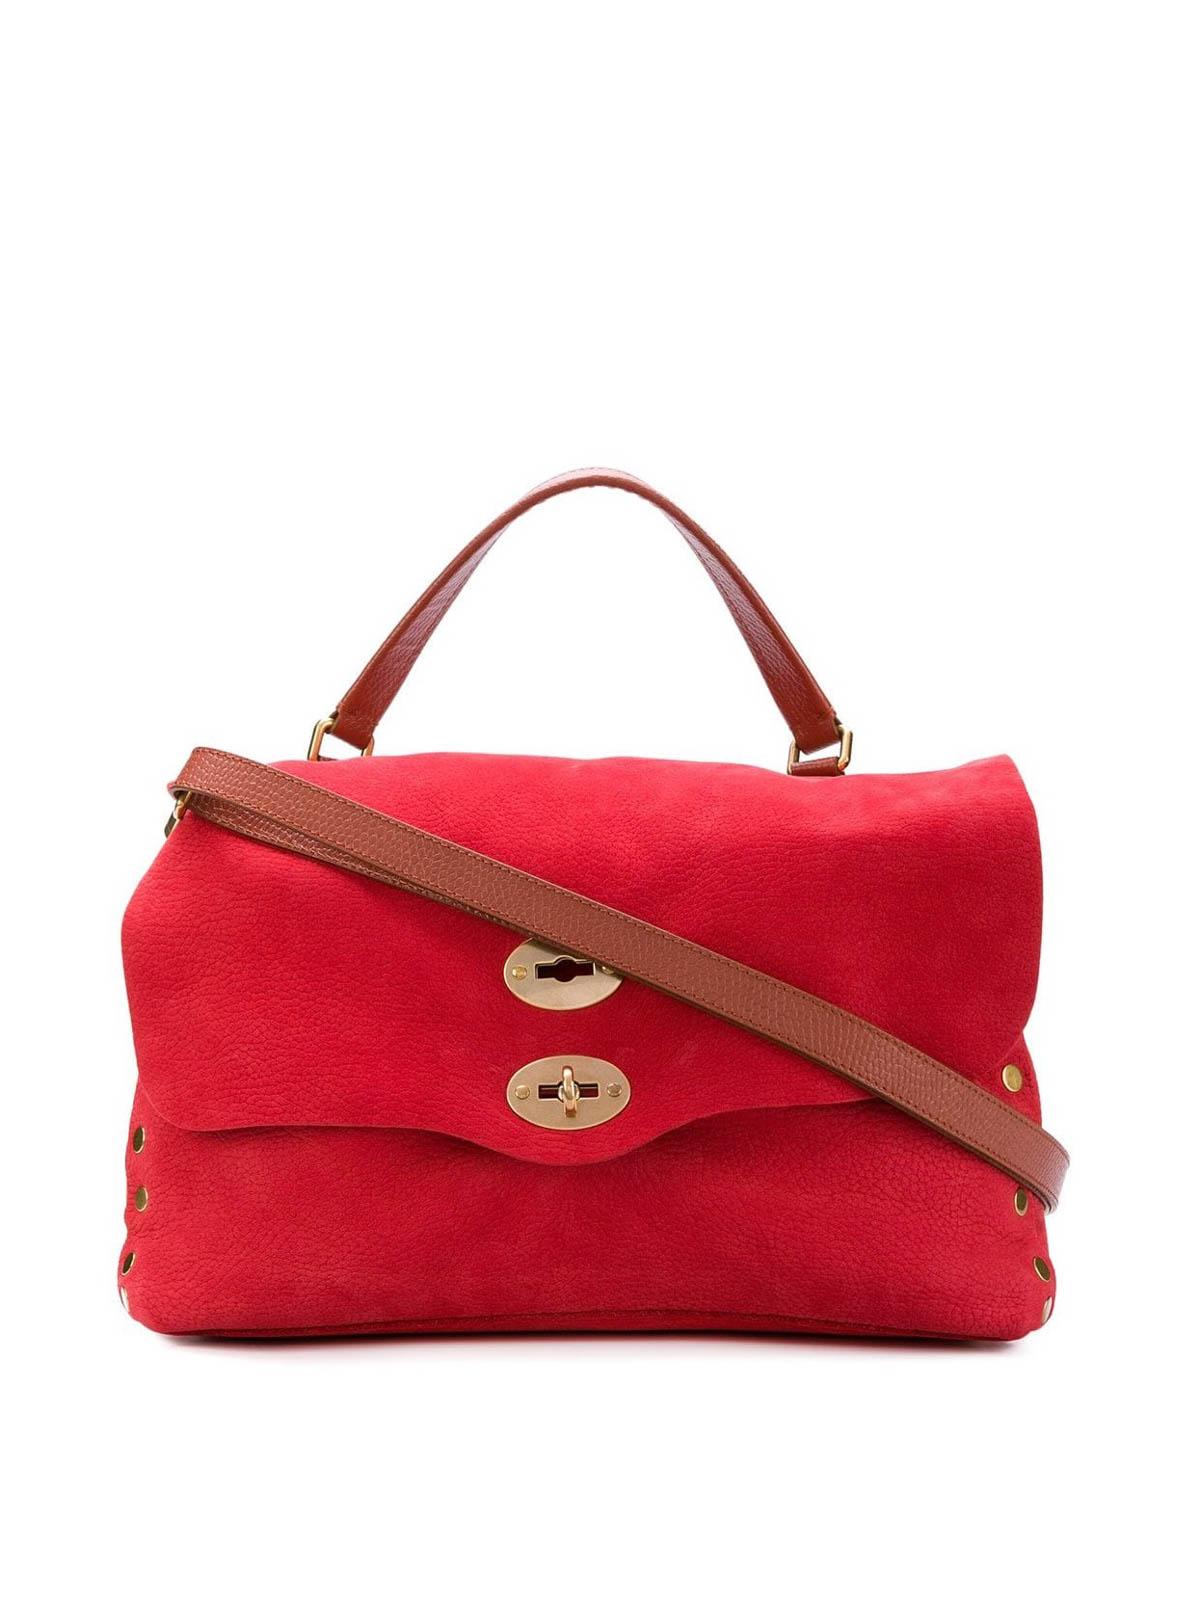 Zanellato Postina M Jones Nubuck Bag In Red